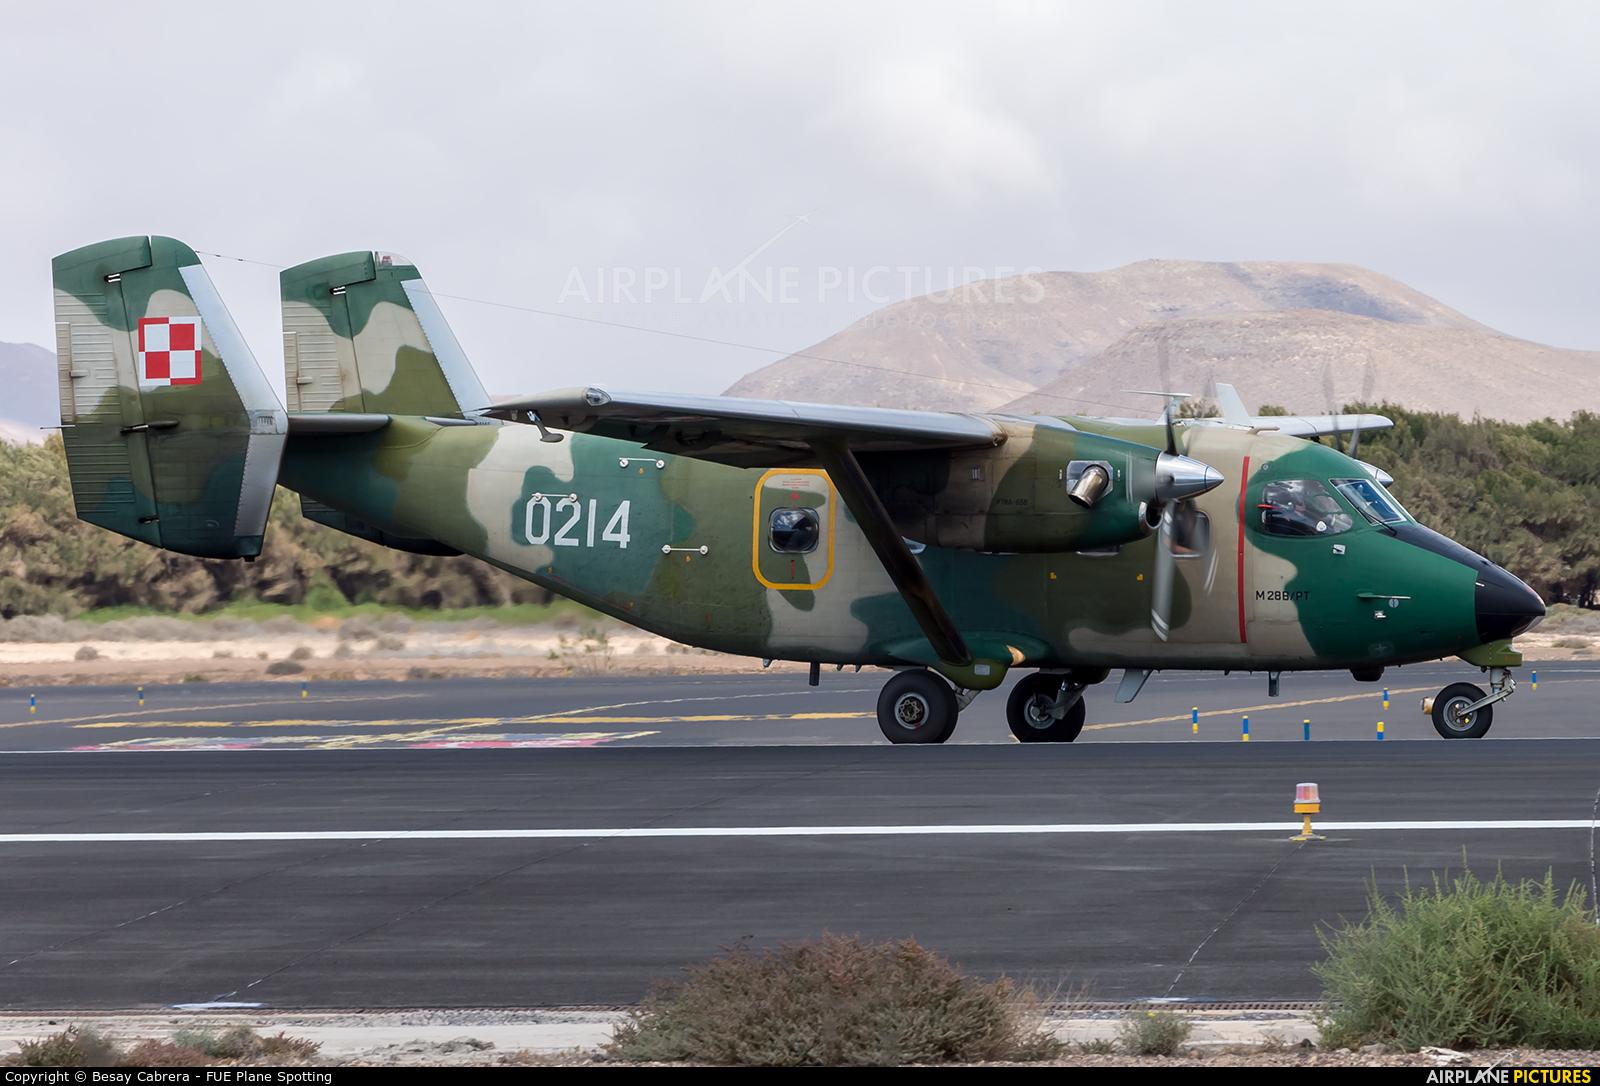 Poland - Air Force 0214 aircraft at Fuerteventura - Puerto del Rosario